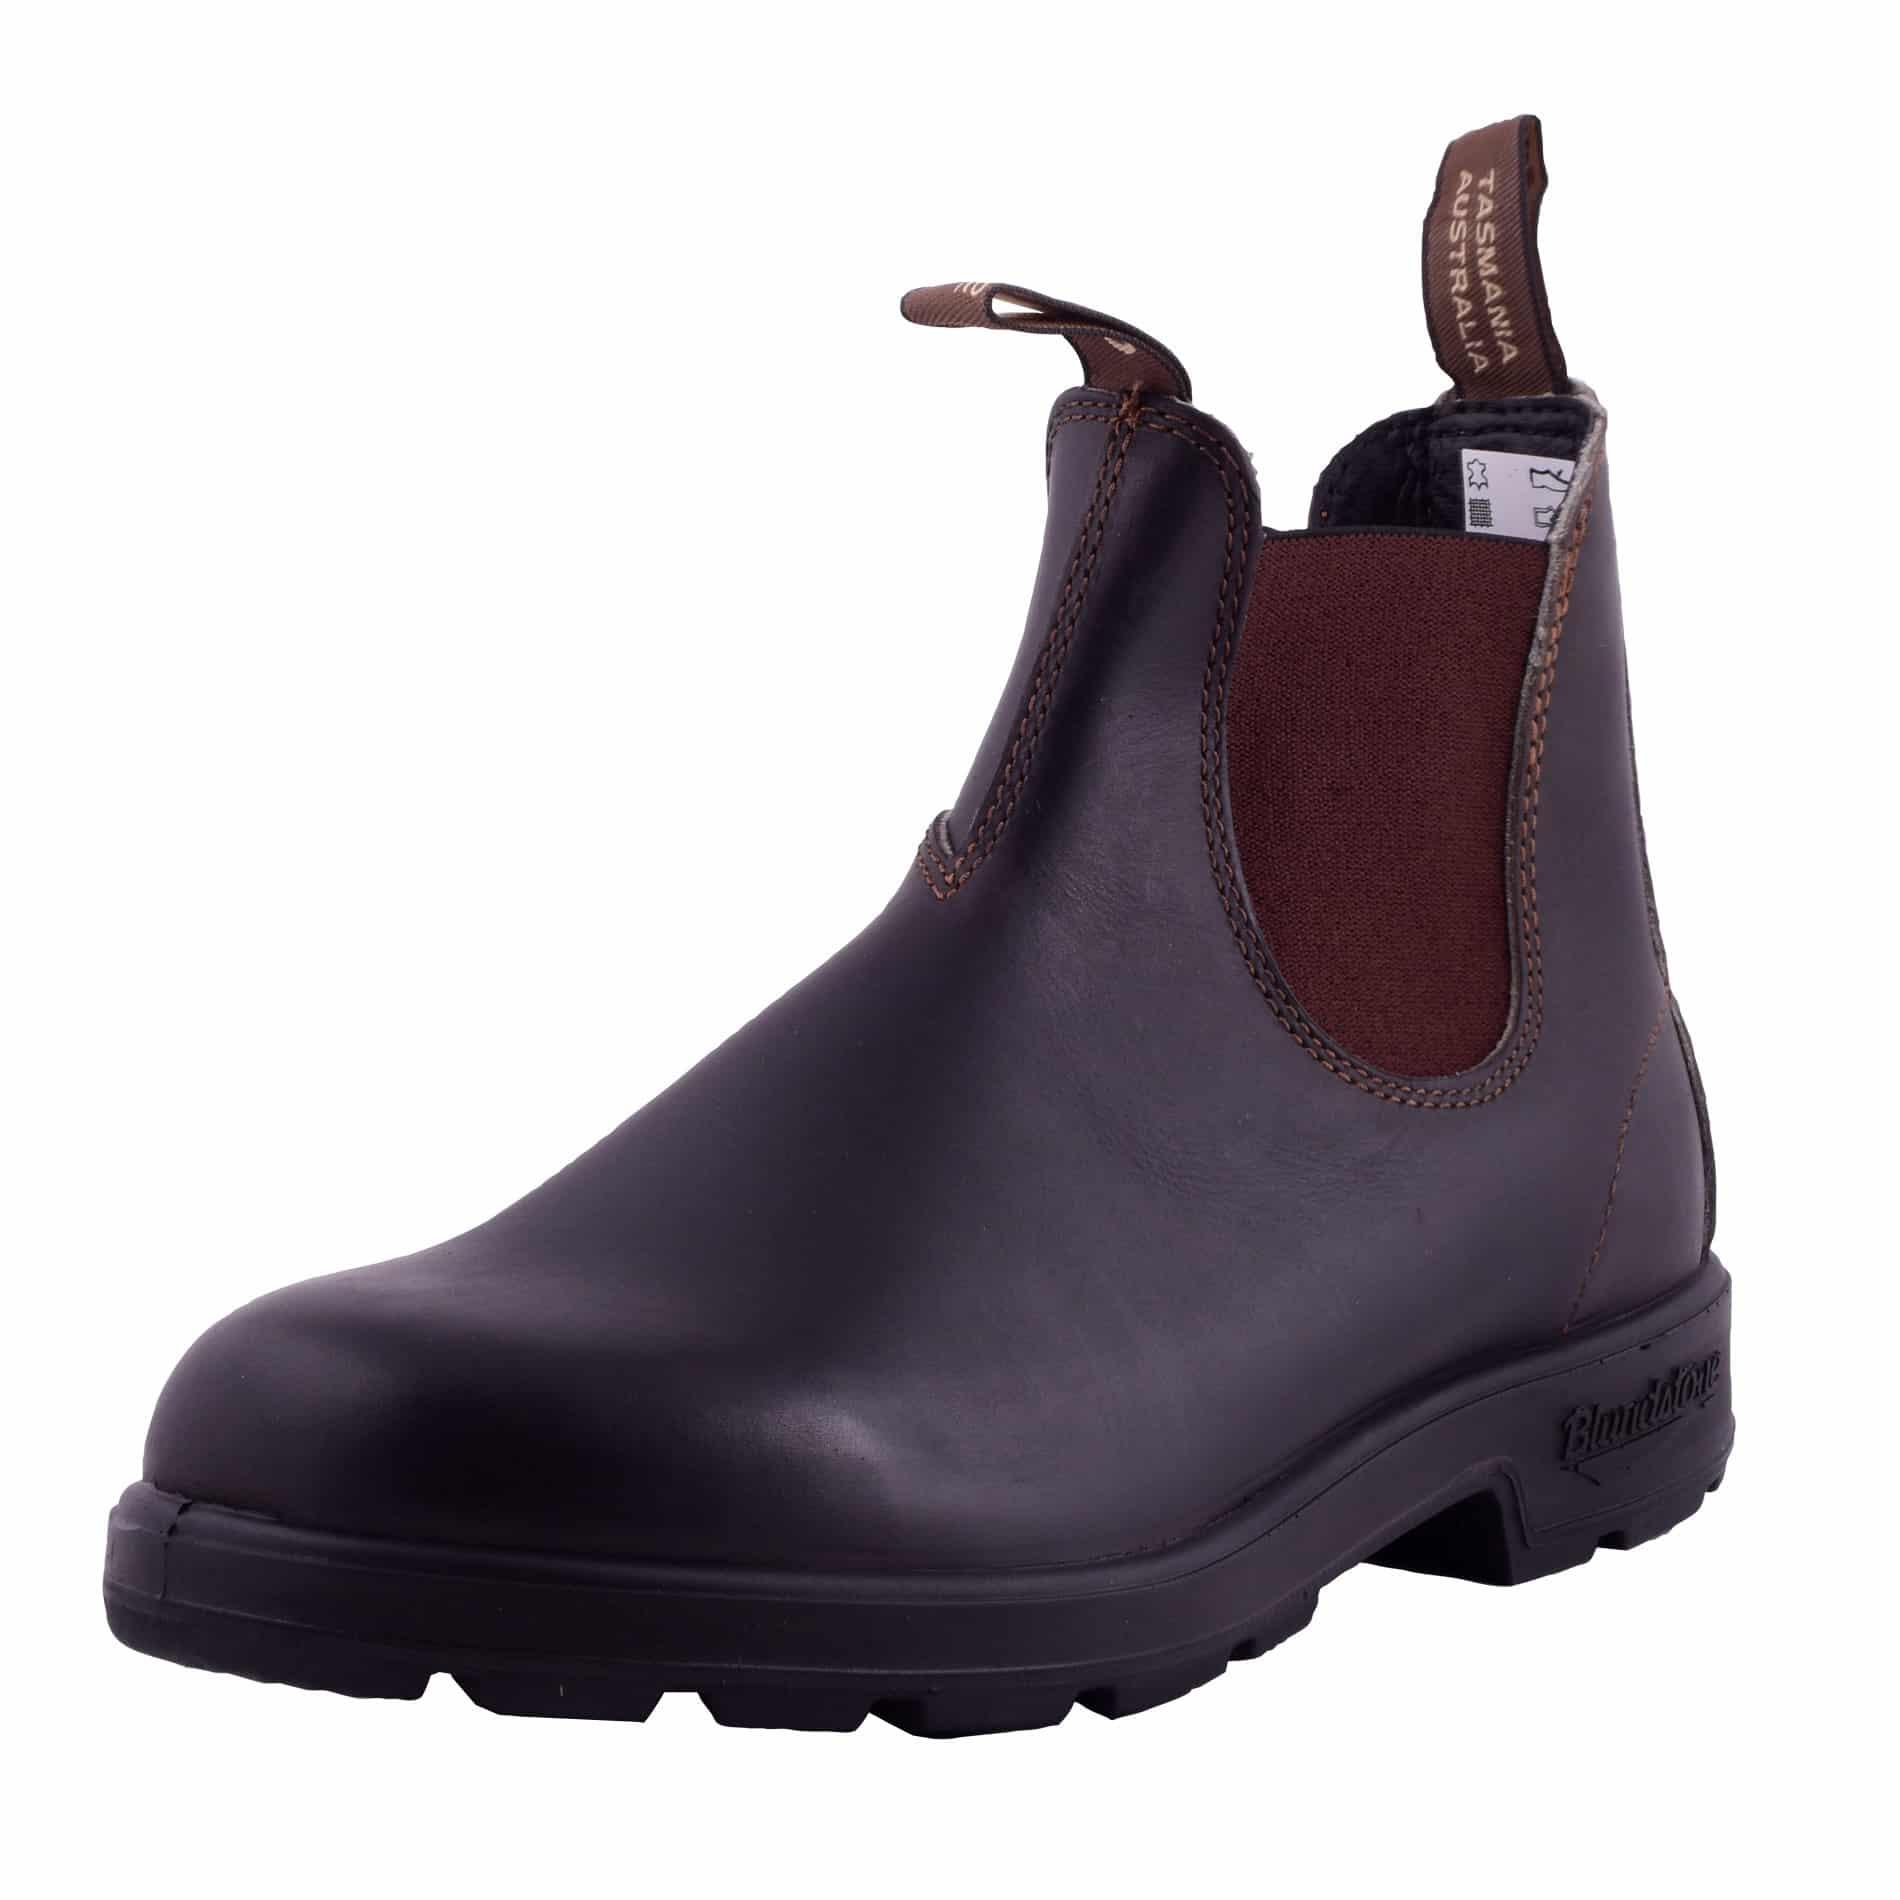 נעלי בלנסטון Blundstone 500